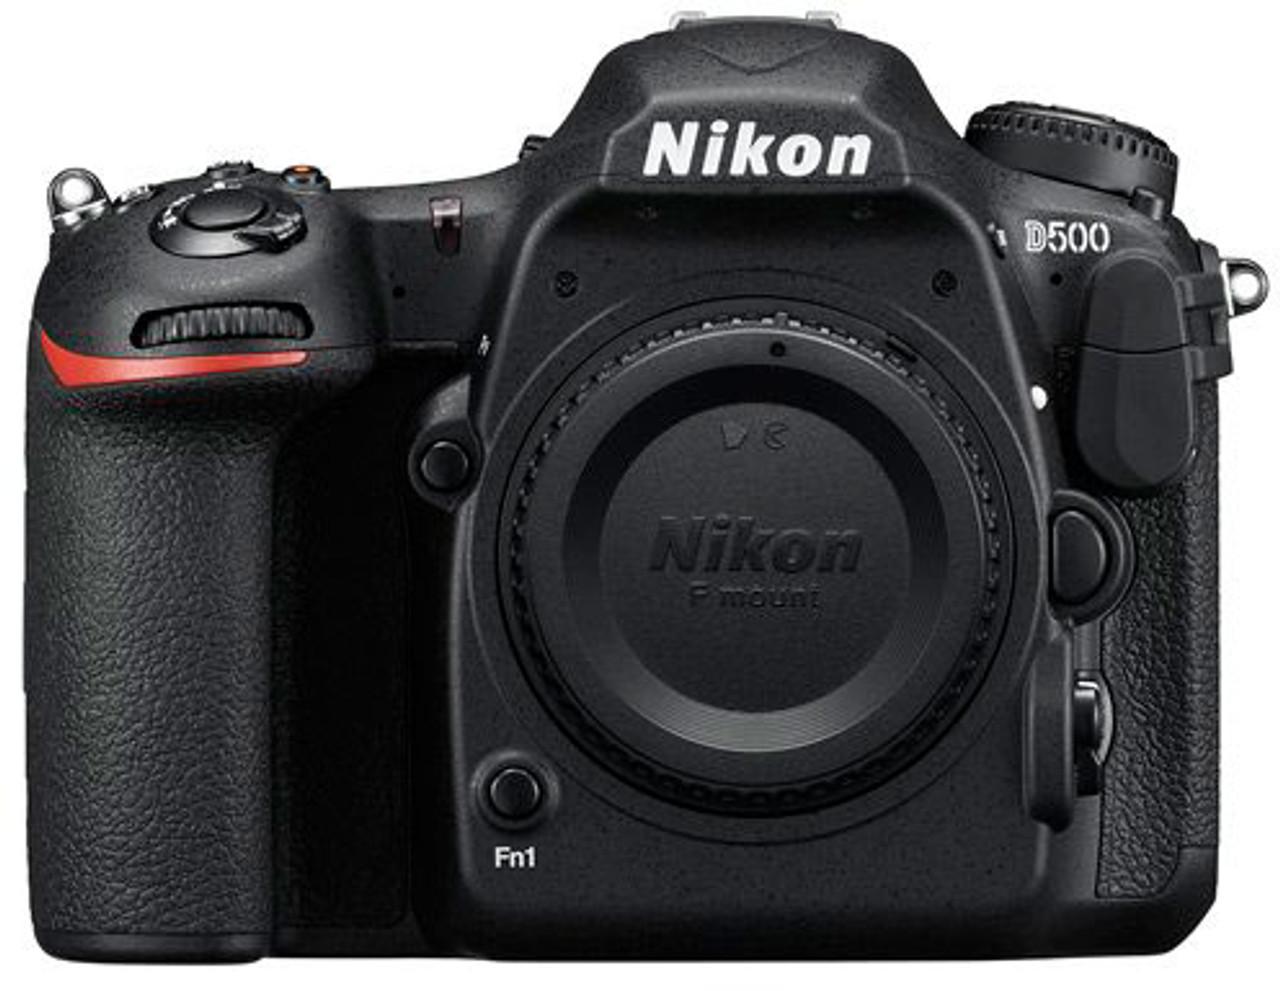 Nikon D500 DSLR Camera - Body Only - Black